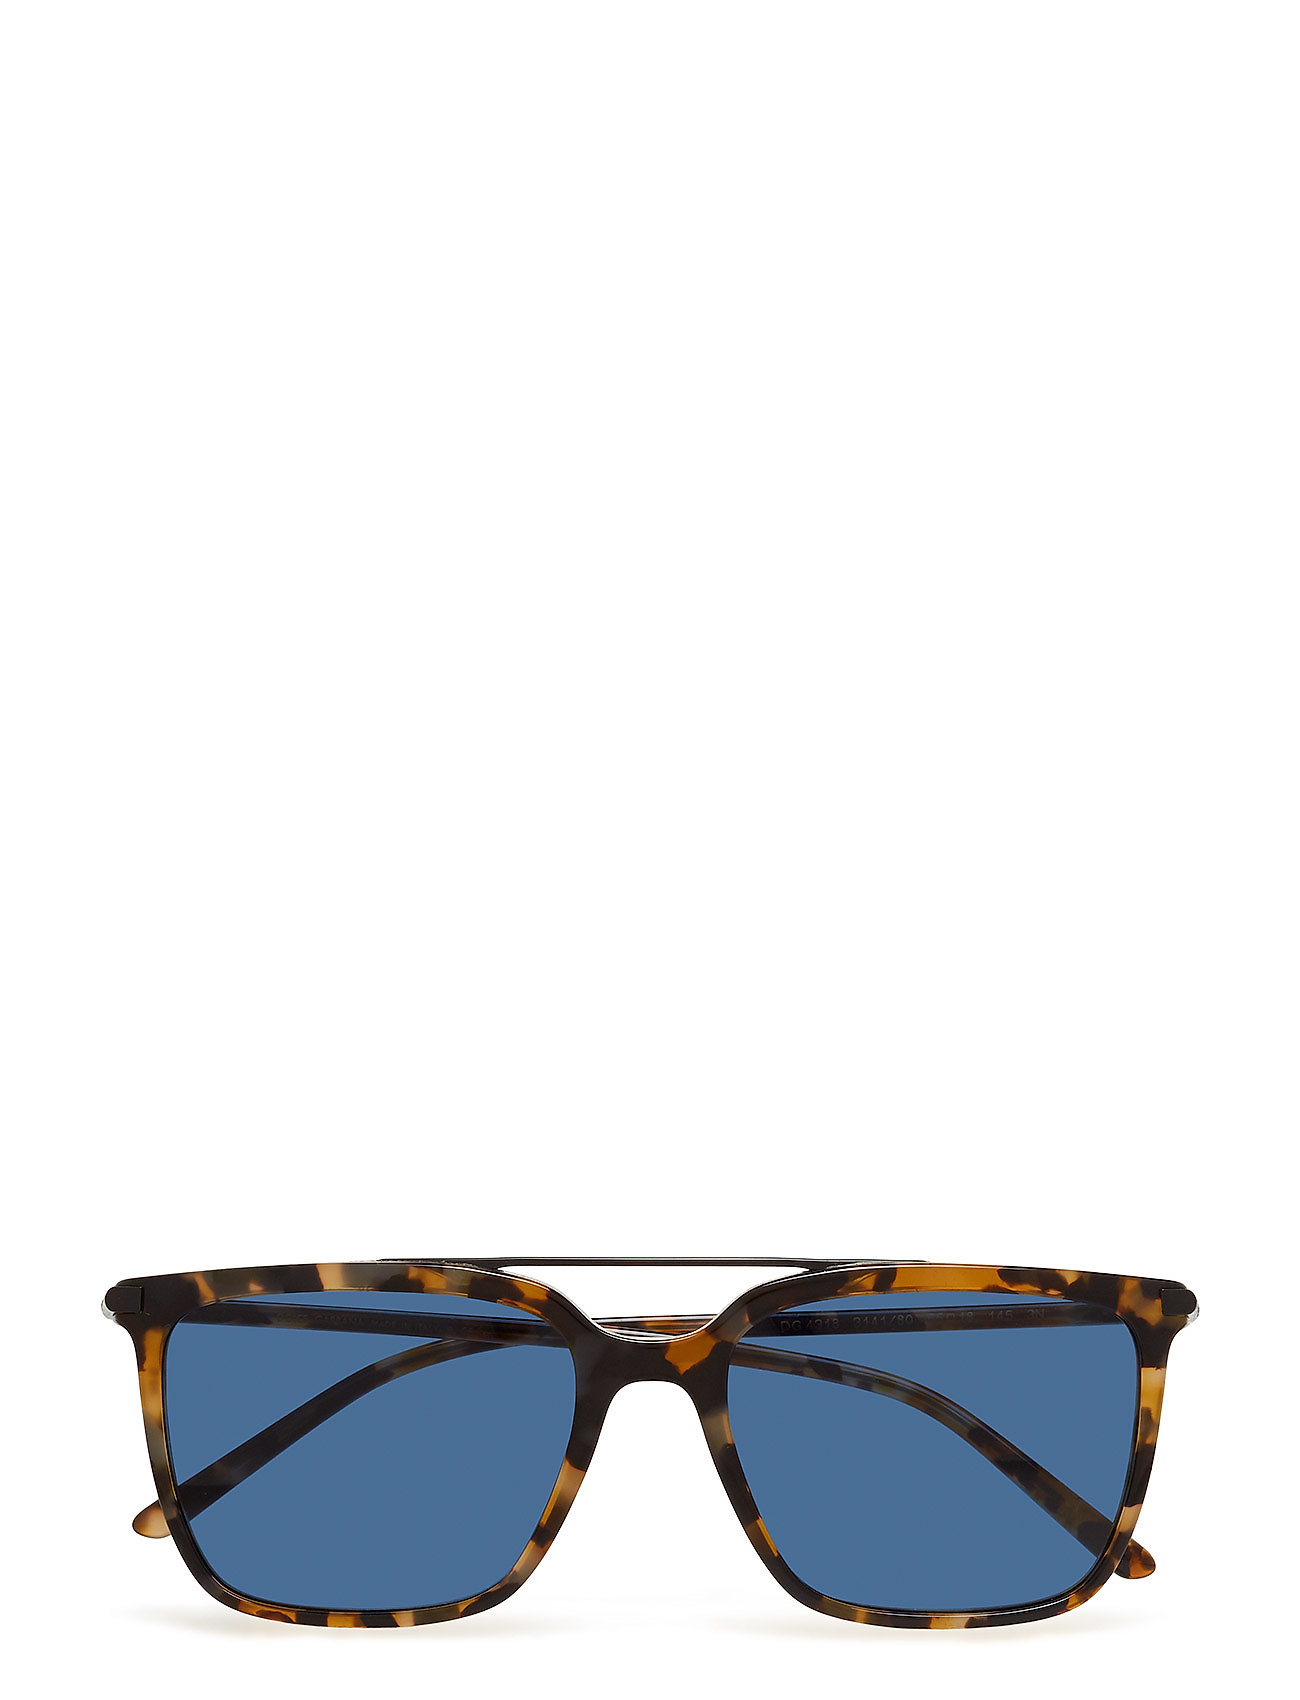 Men'S Sunglasses Wayfarer Sonnenbrille Blau DOLCE & GABBANA SUNGLASSES